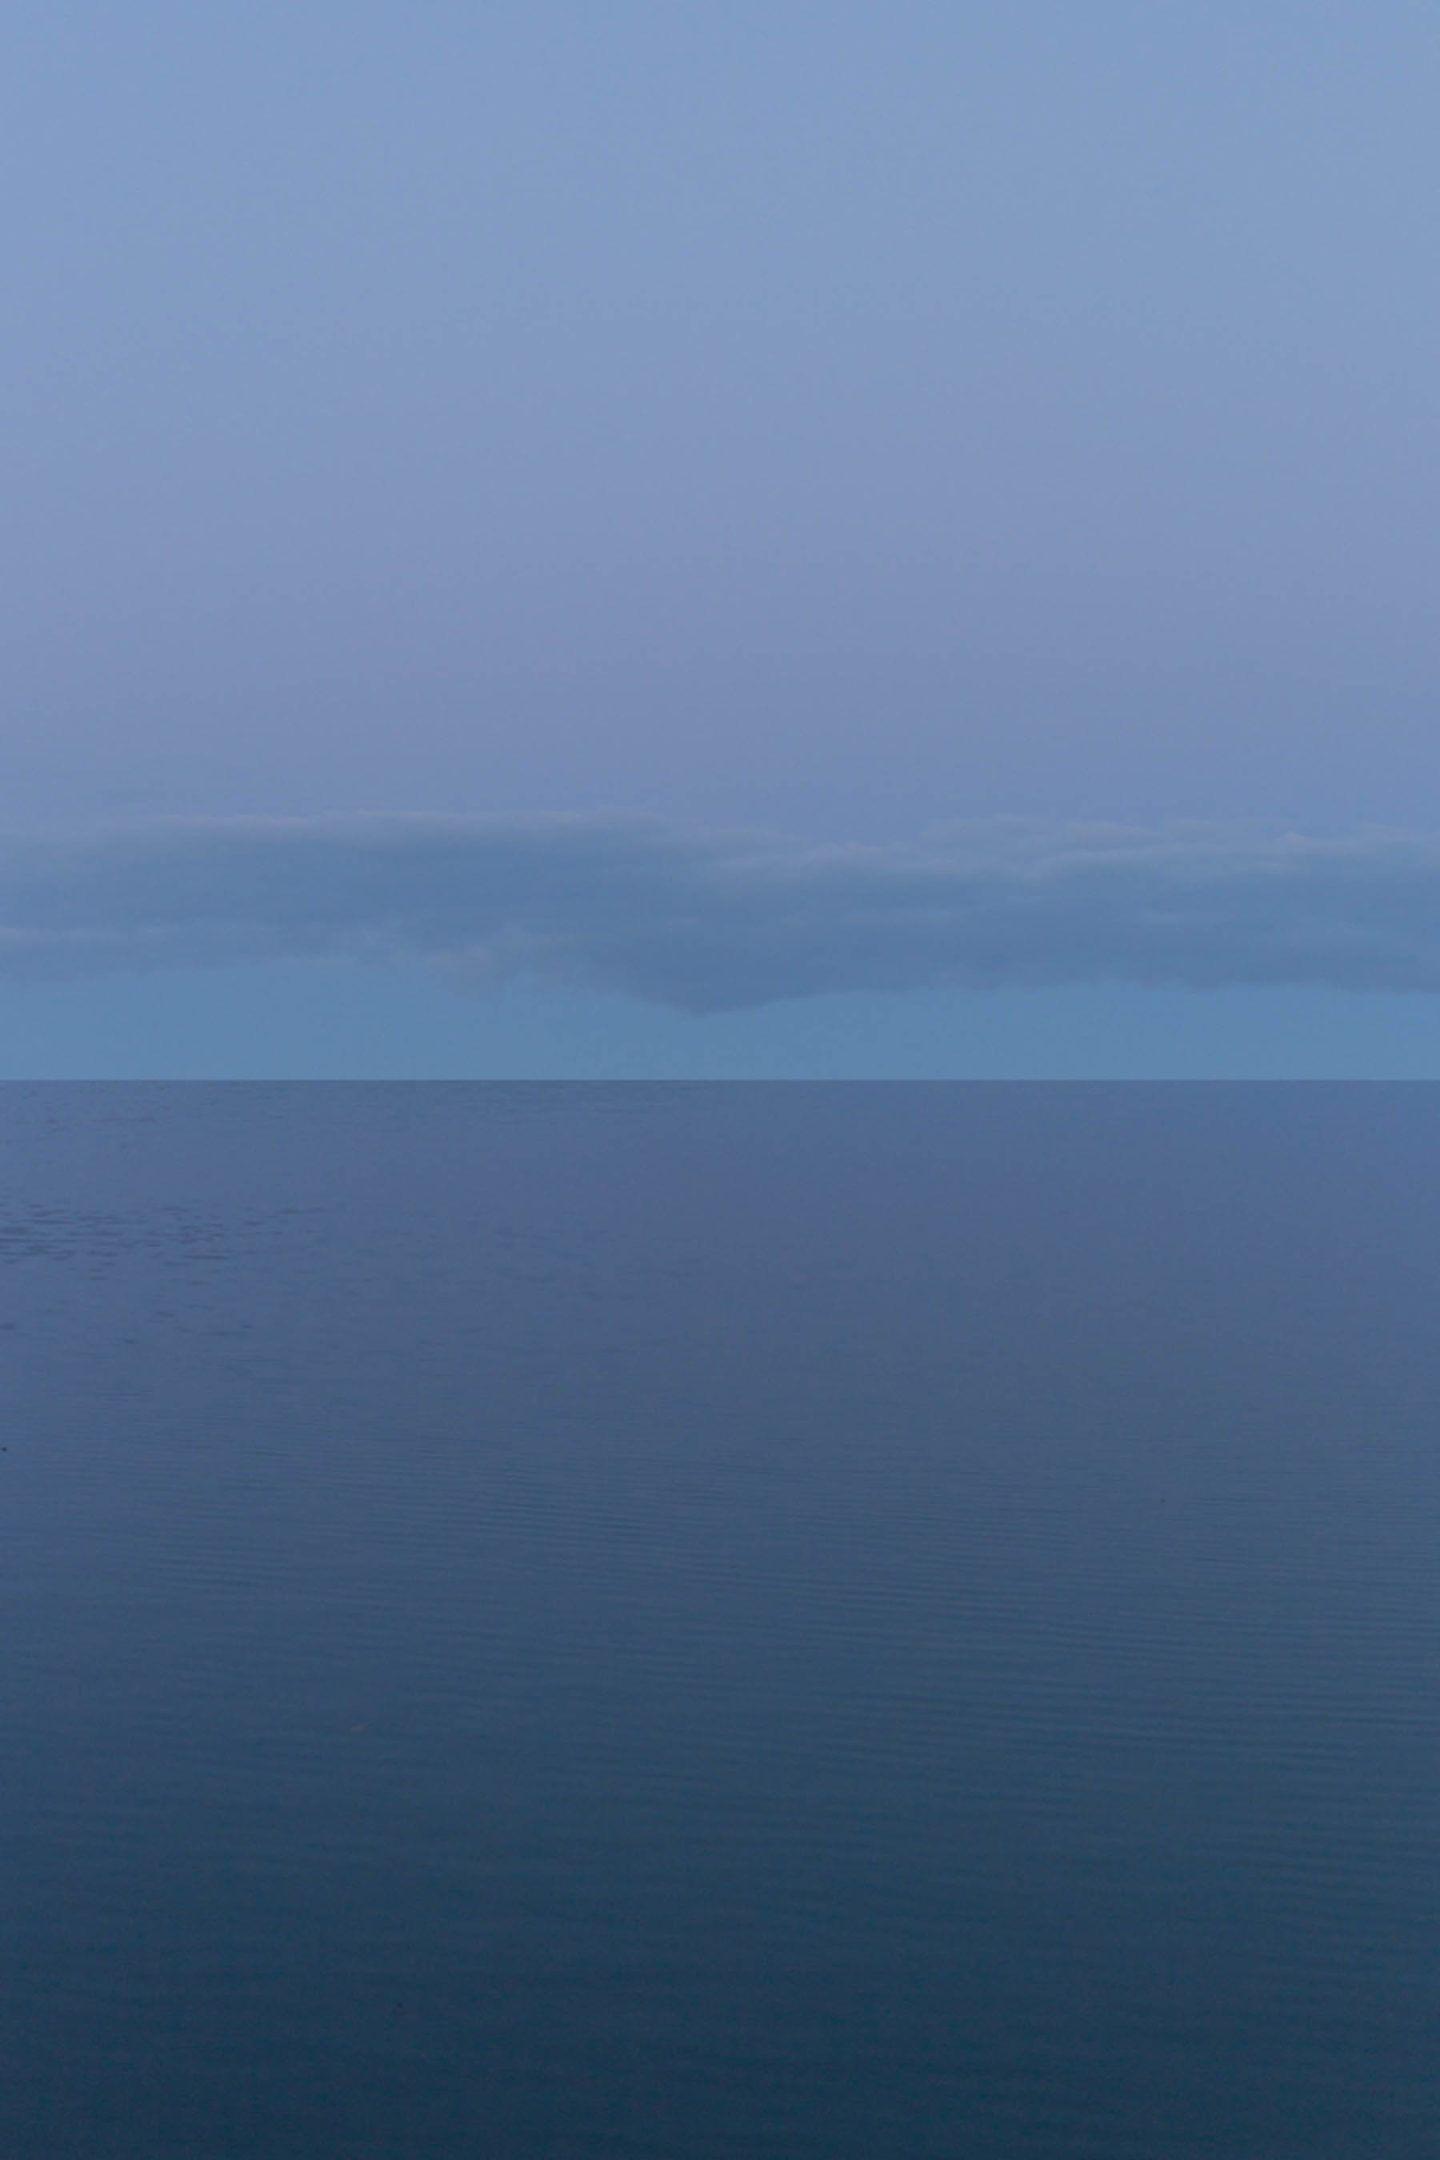 IGNANT-Photography-Naohiro-Maeda-Passages-0014